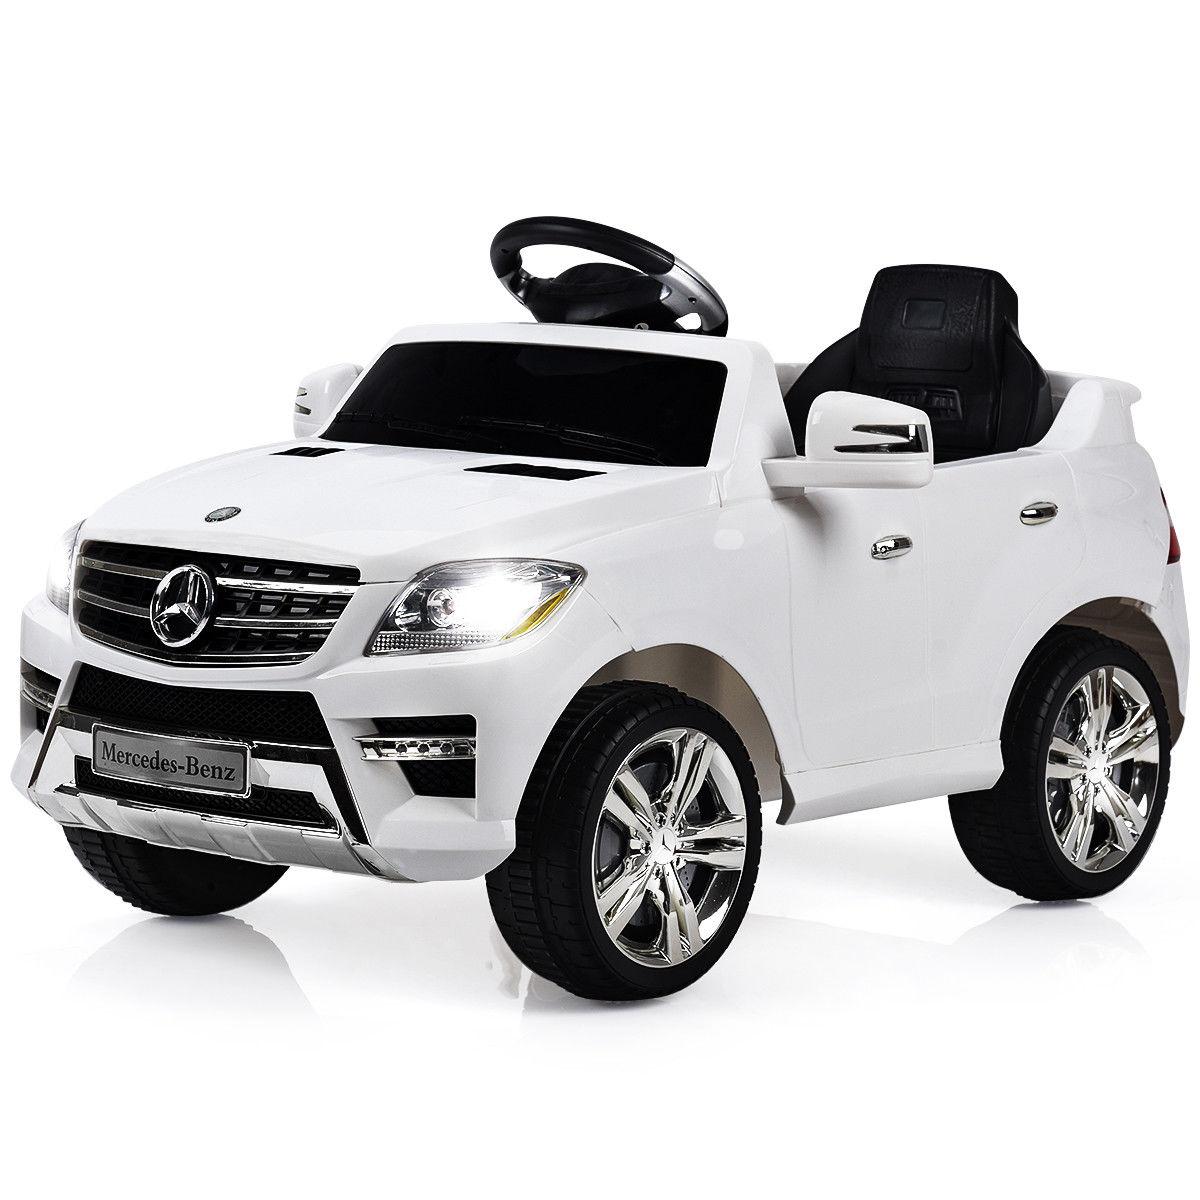 Costway: Costway Mercedes Benz ML350 6V Electric Kids Ride